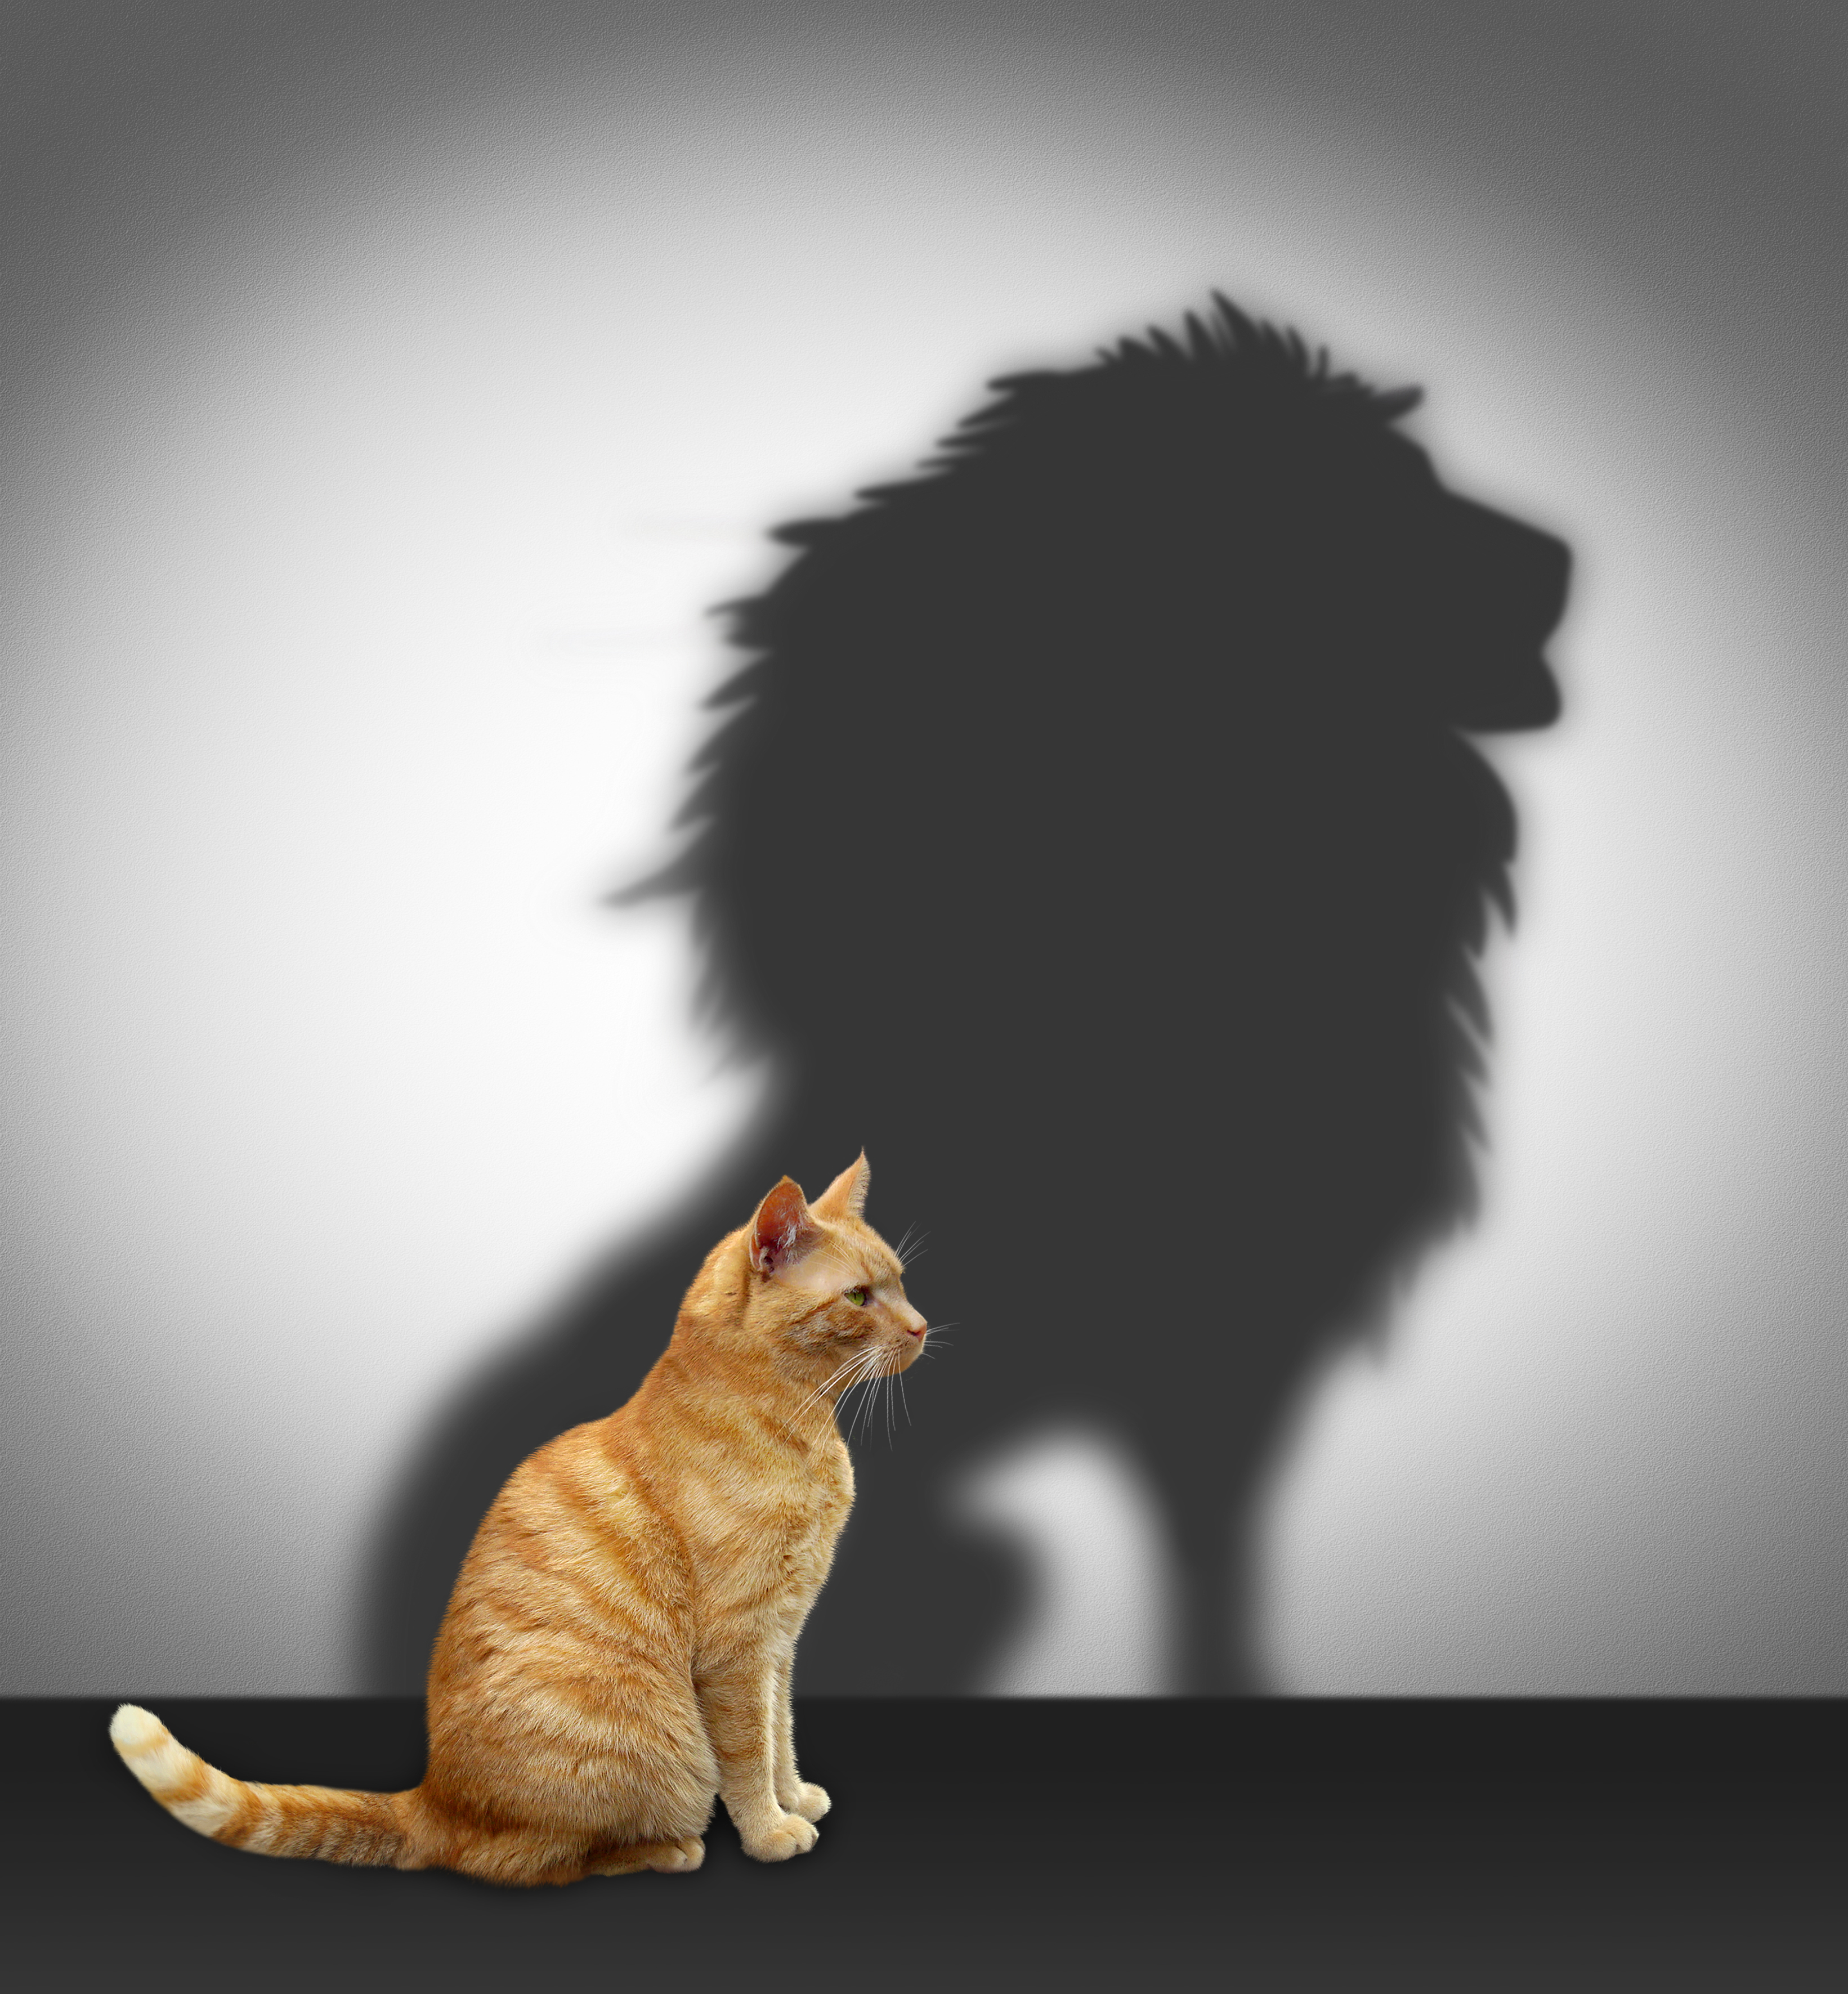 confidence-cat-lion.jpg